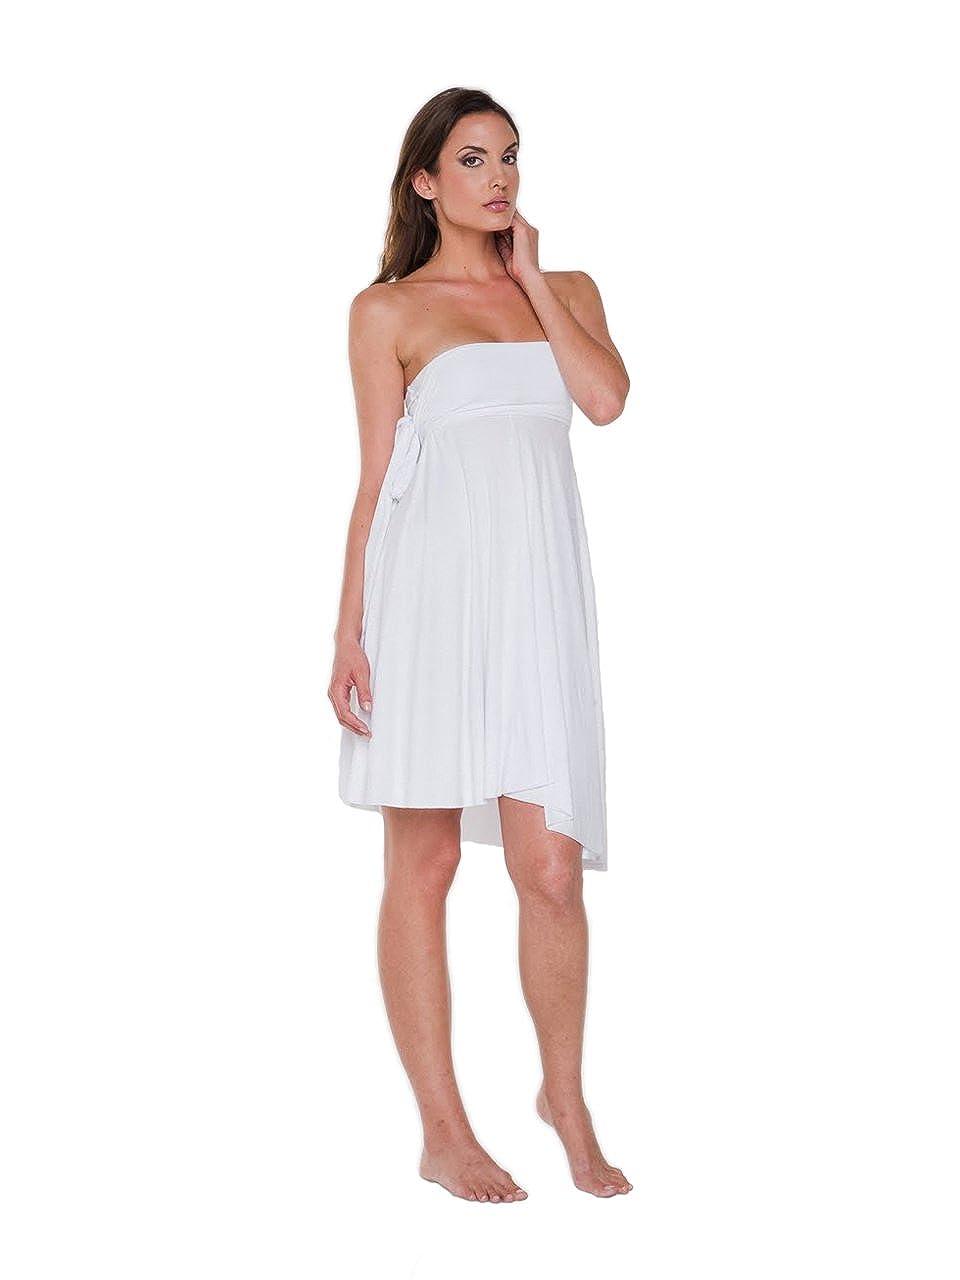 Vivians Fashions Dress//Skirt Twist Wrap 12 Ways to Wear